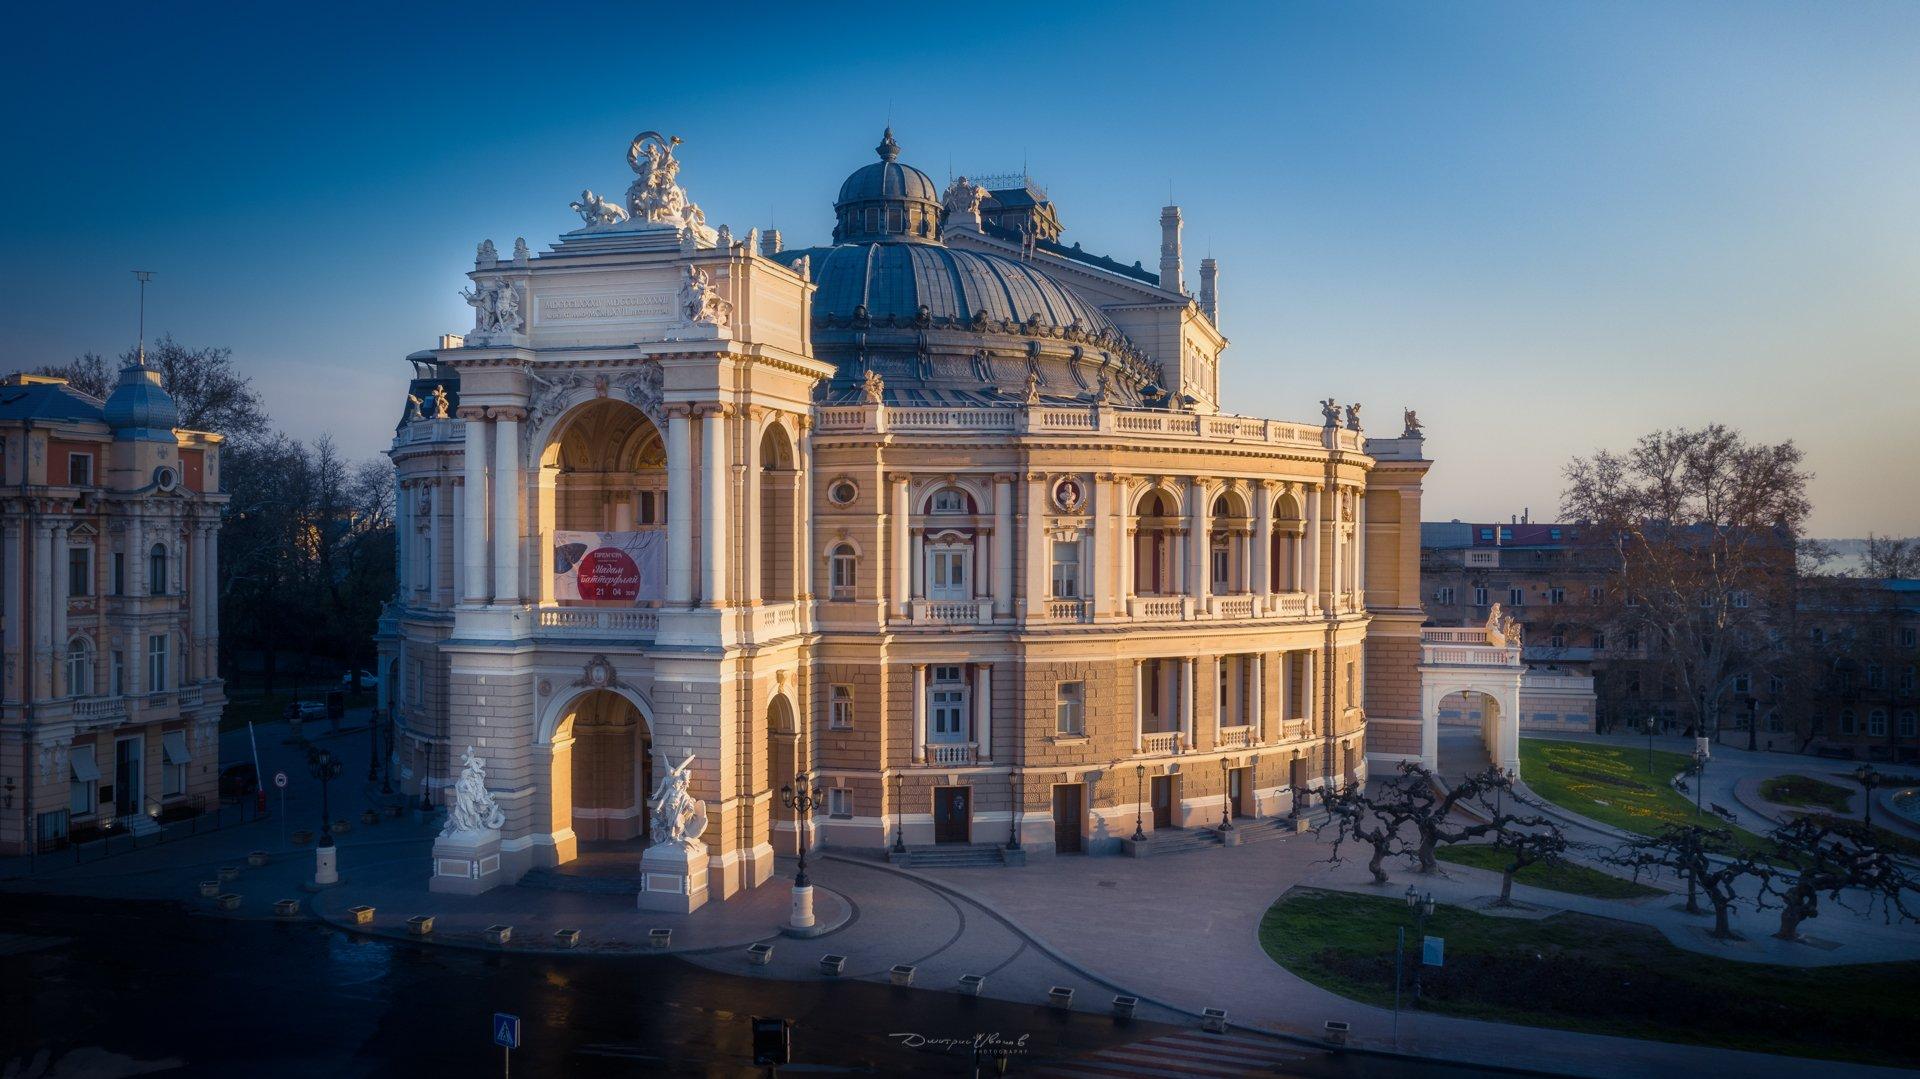 odessa, building, opera, sunrise, morning, city, город, одесса, опера, архитектура, Дмитрий Иванов